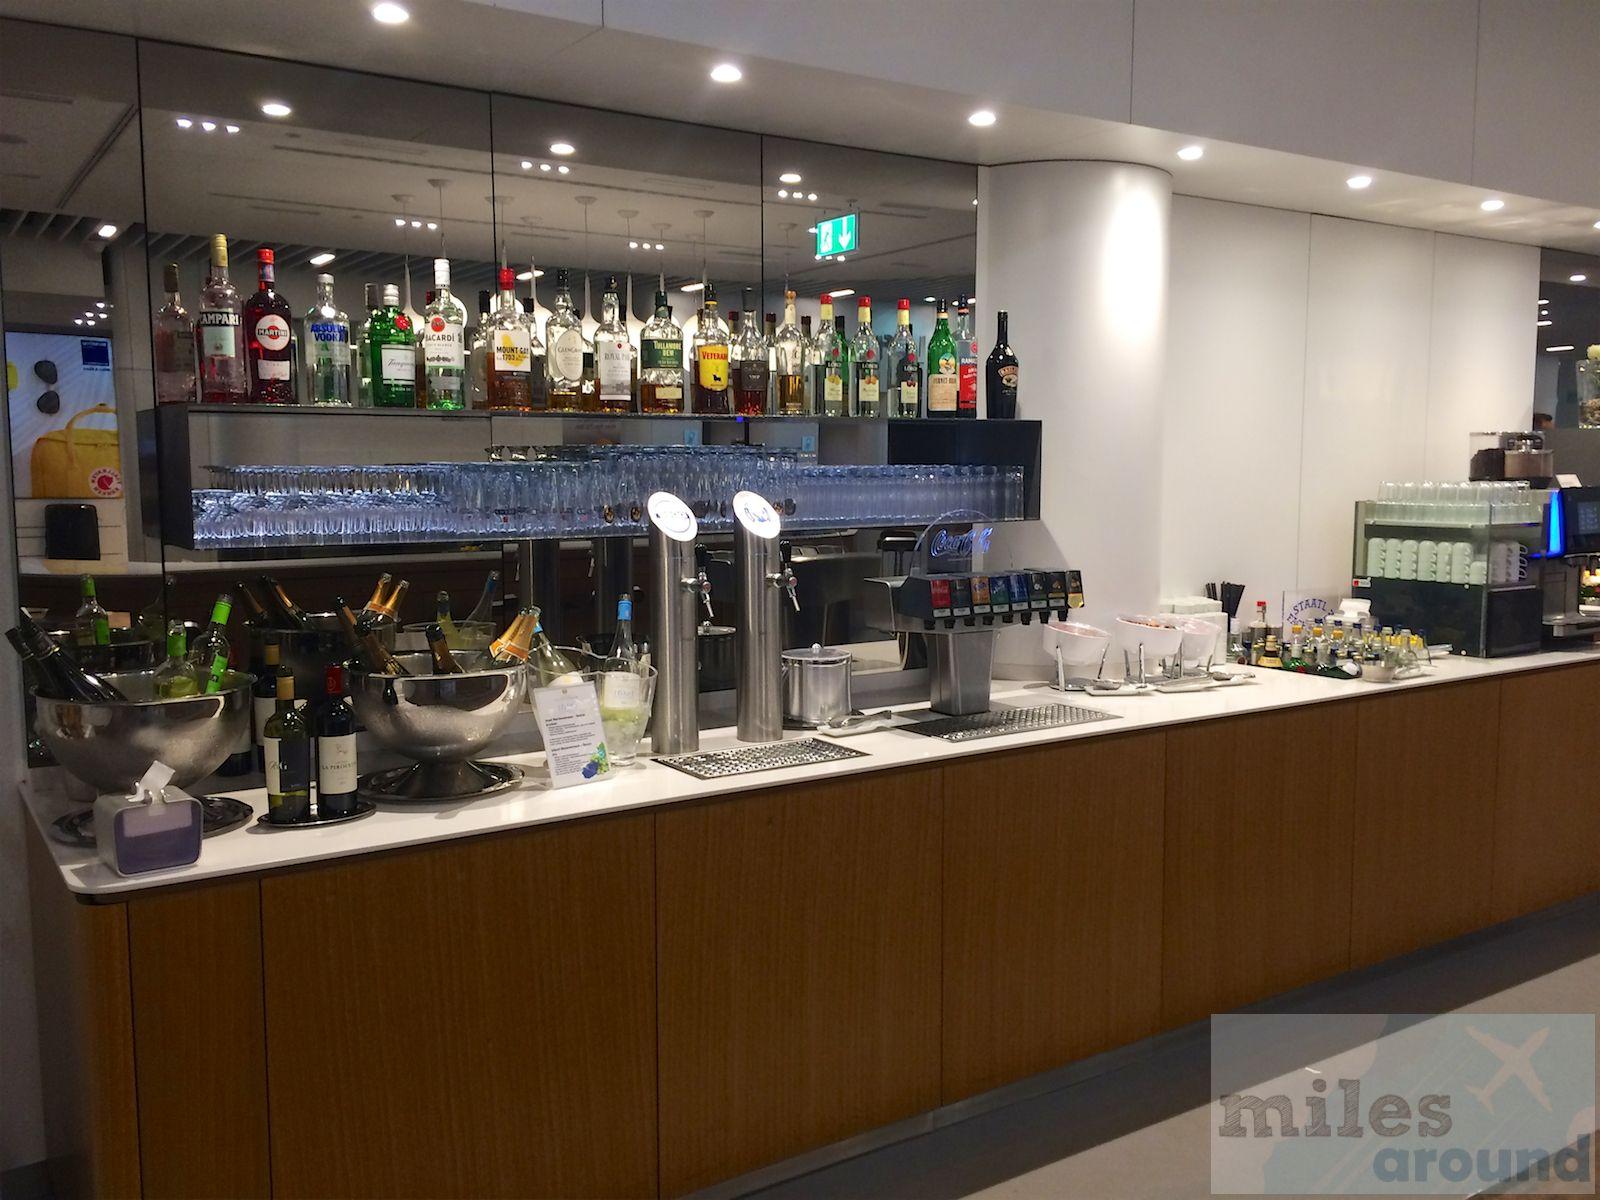 Review Lufthansa Senator Lounge AGates am Flughafen